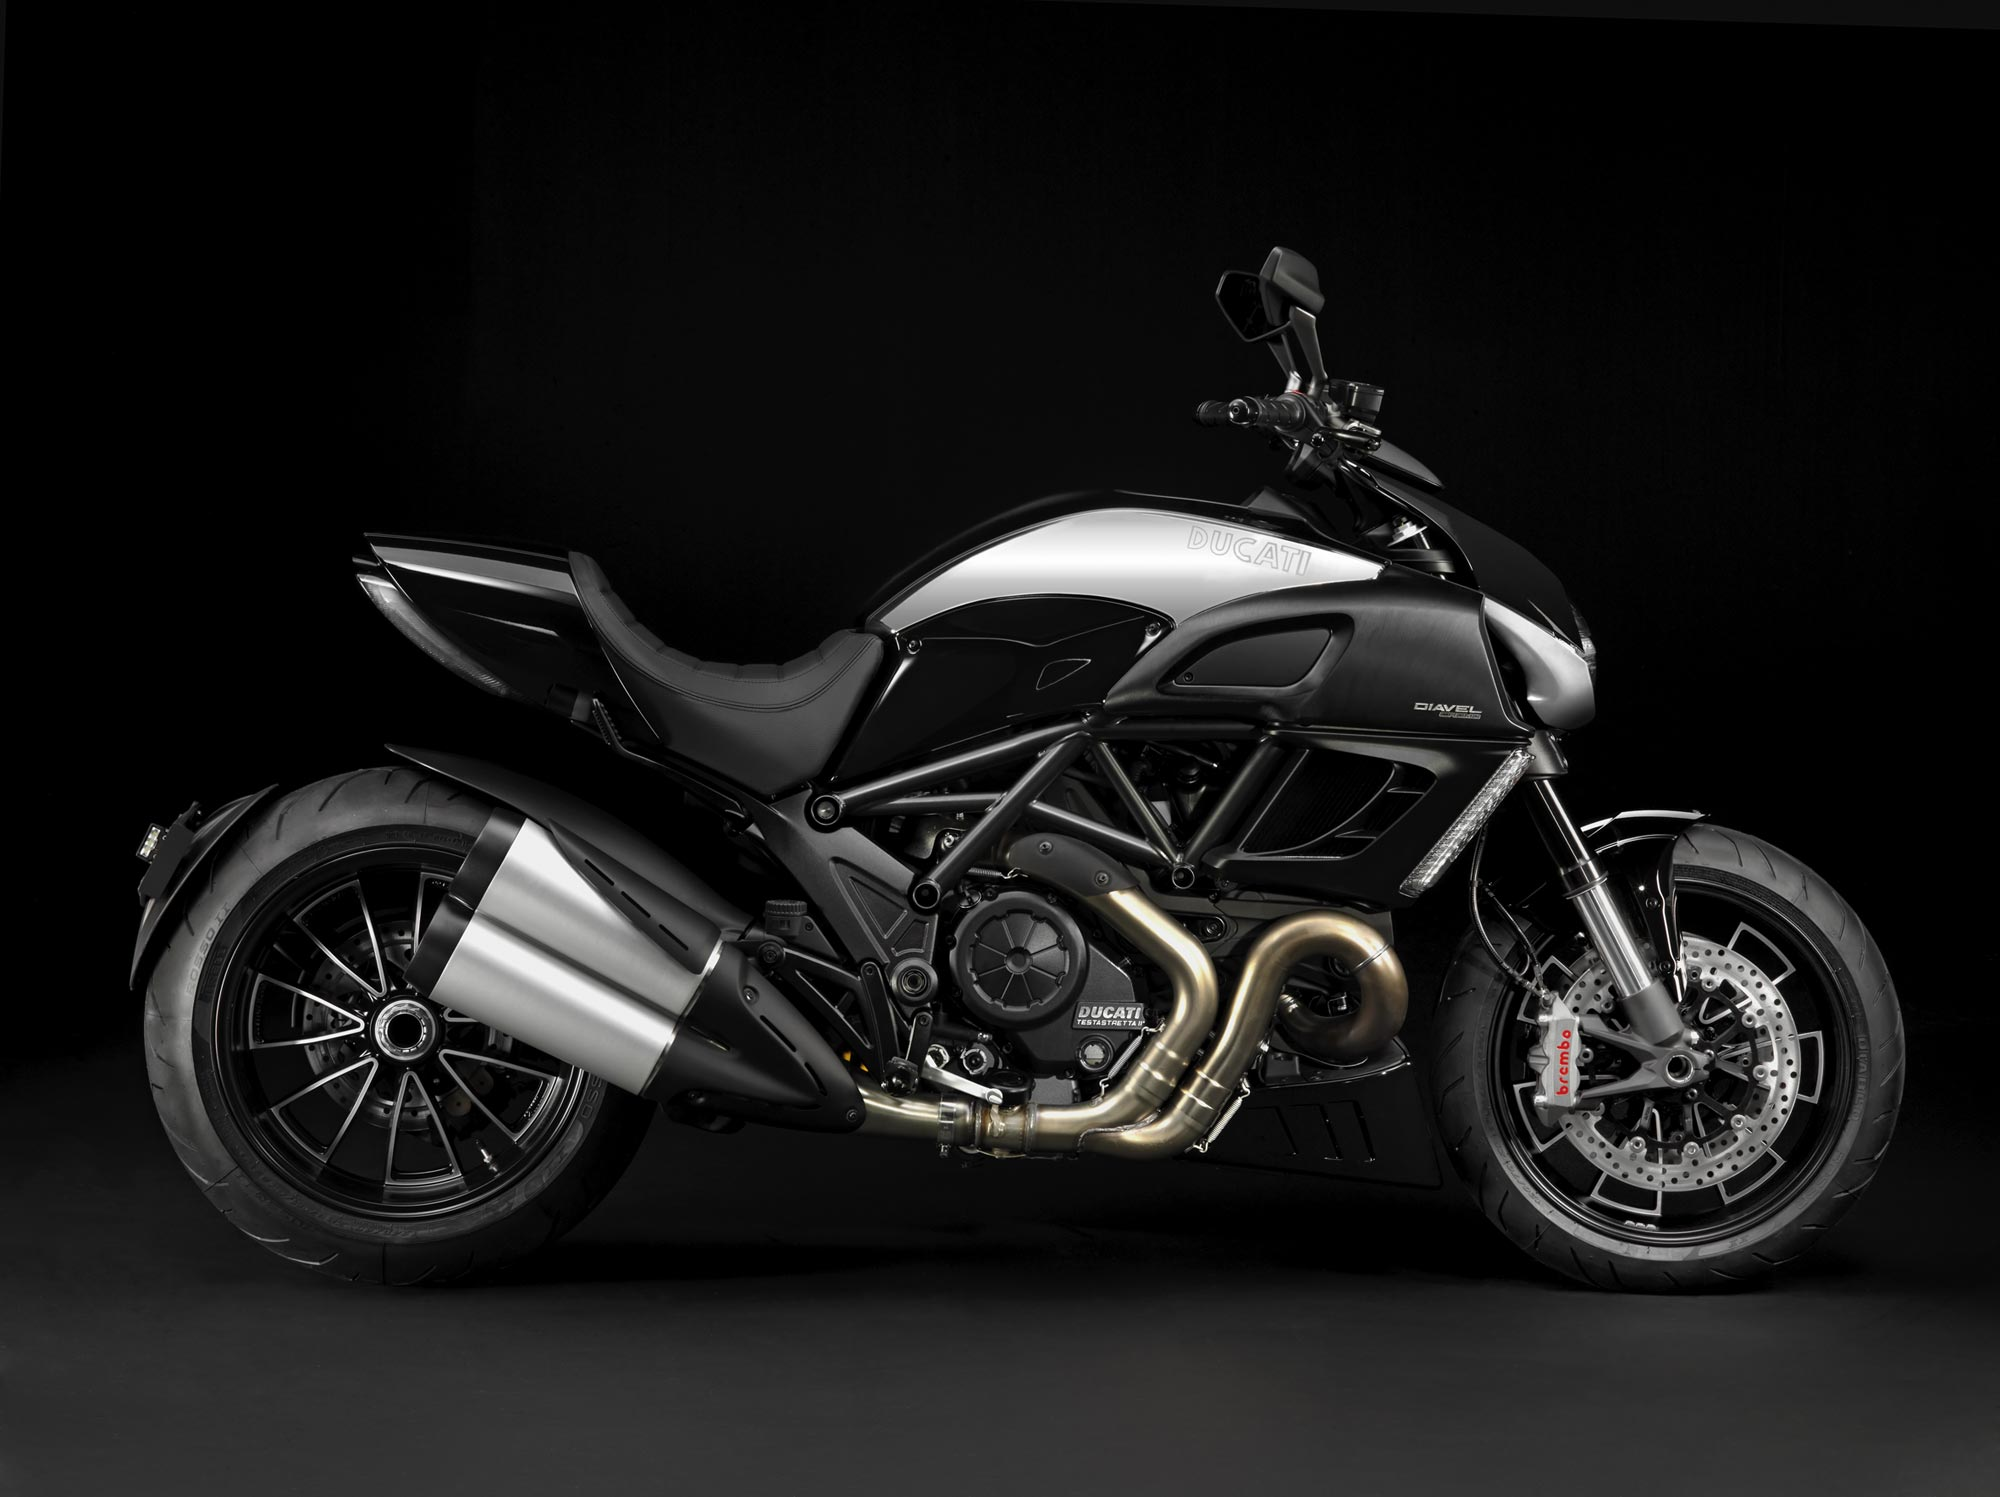 Ducati Diavel 16172 Hd Wallpapers in Bikes   Imagescicom 2000x1497